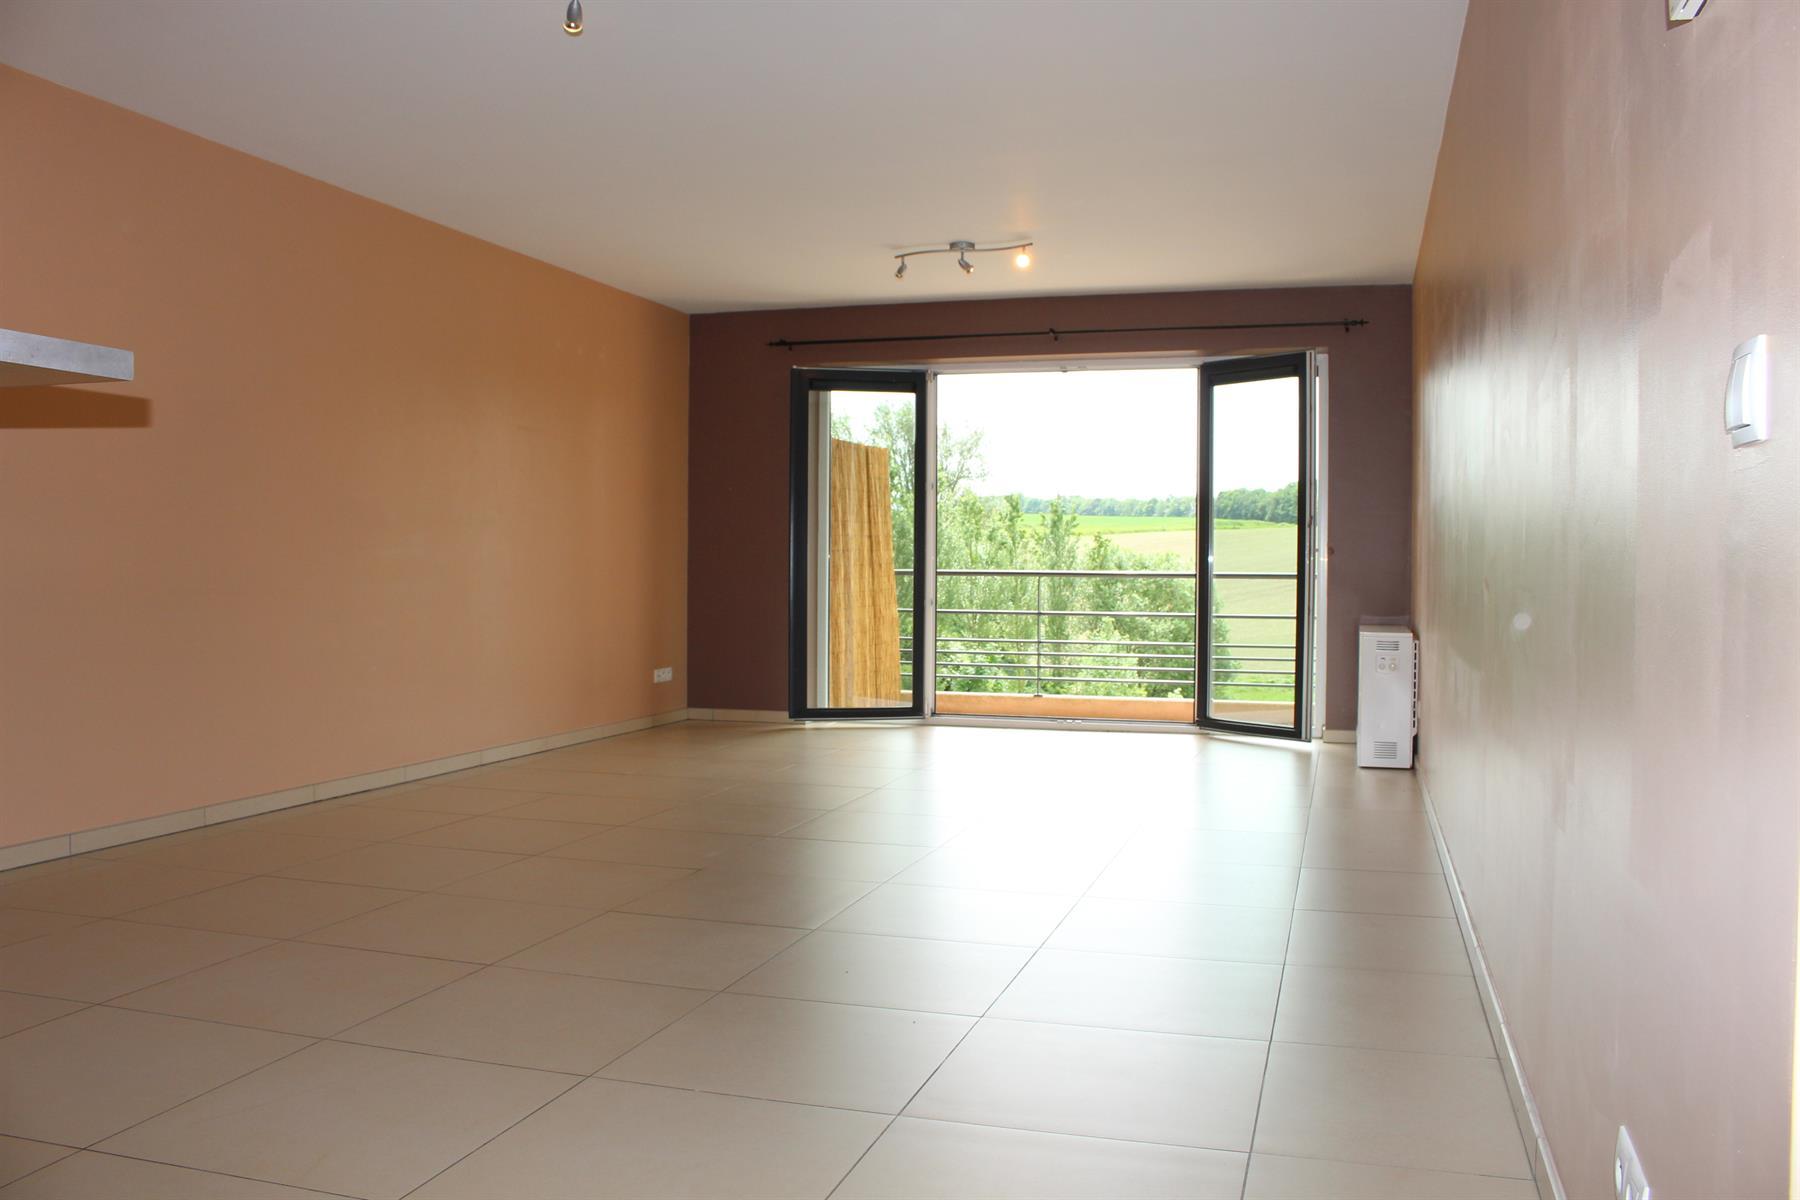 Appartement - Nivelles - #4099995-2